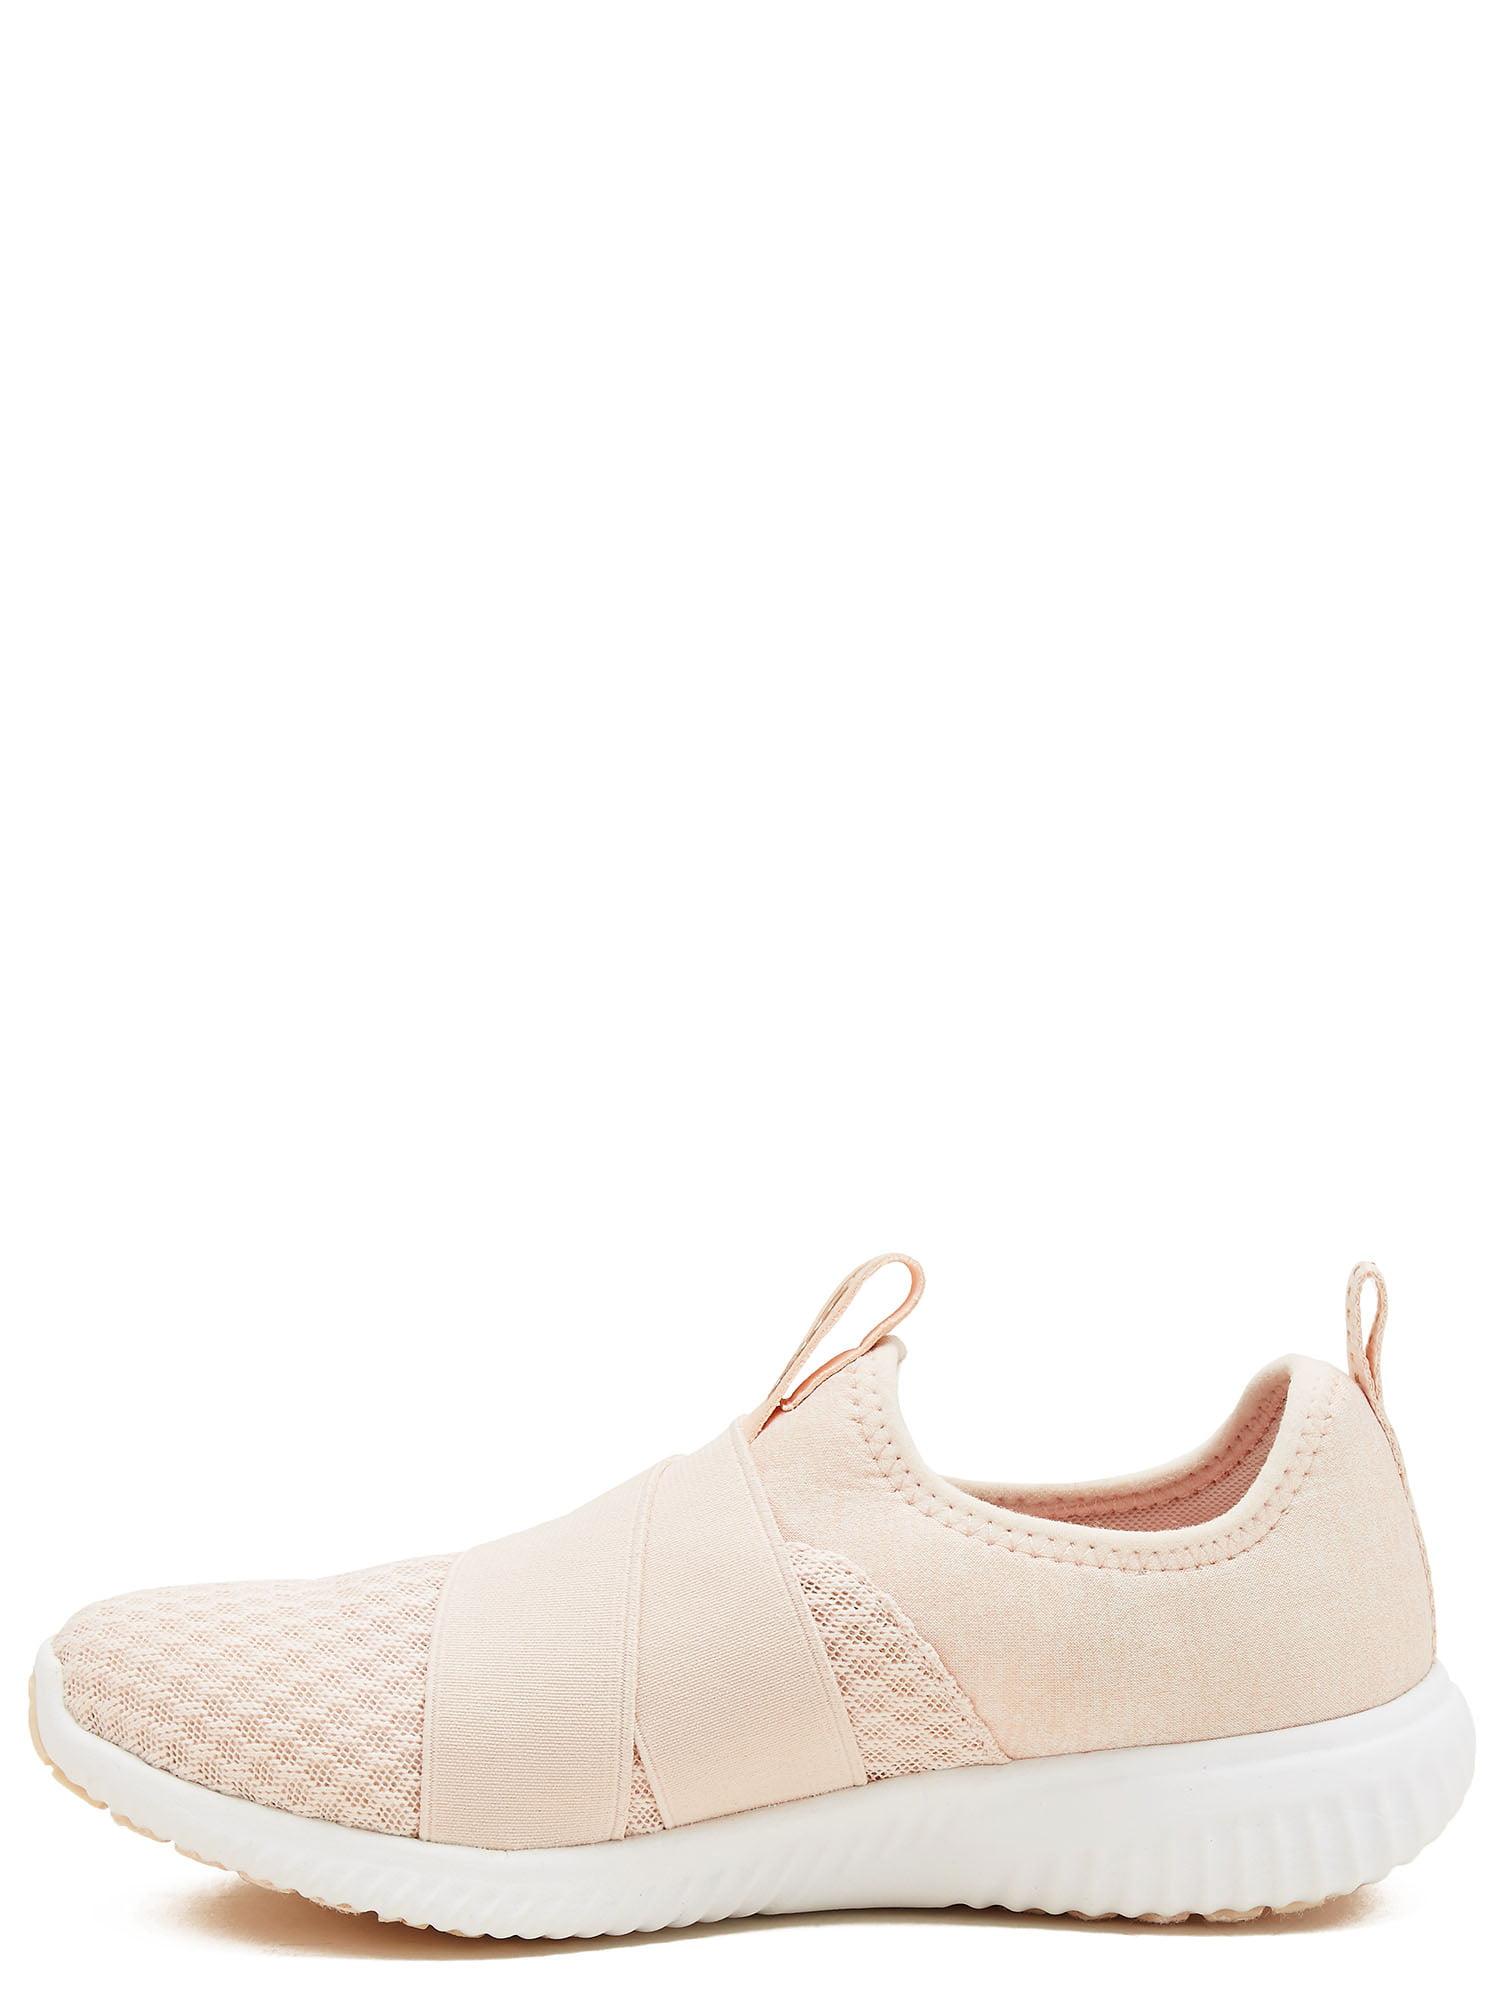 Avia Women?s Asym Strap Athletic Shoe